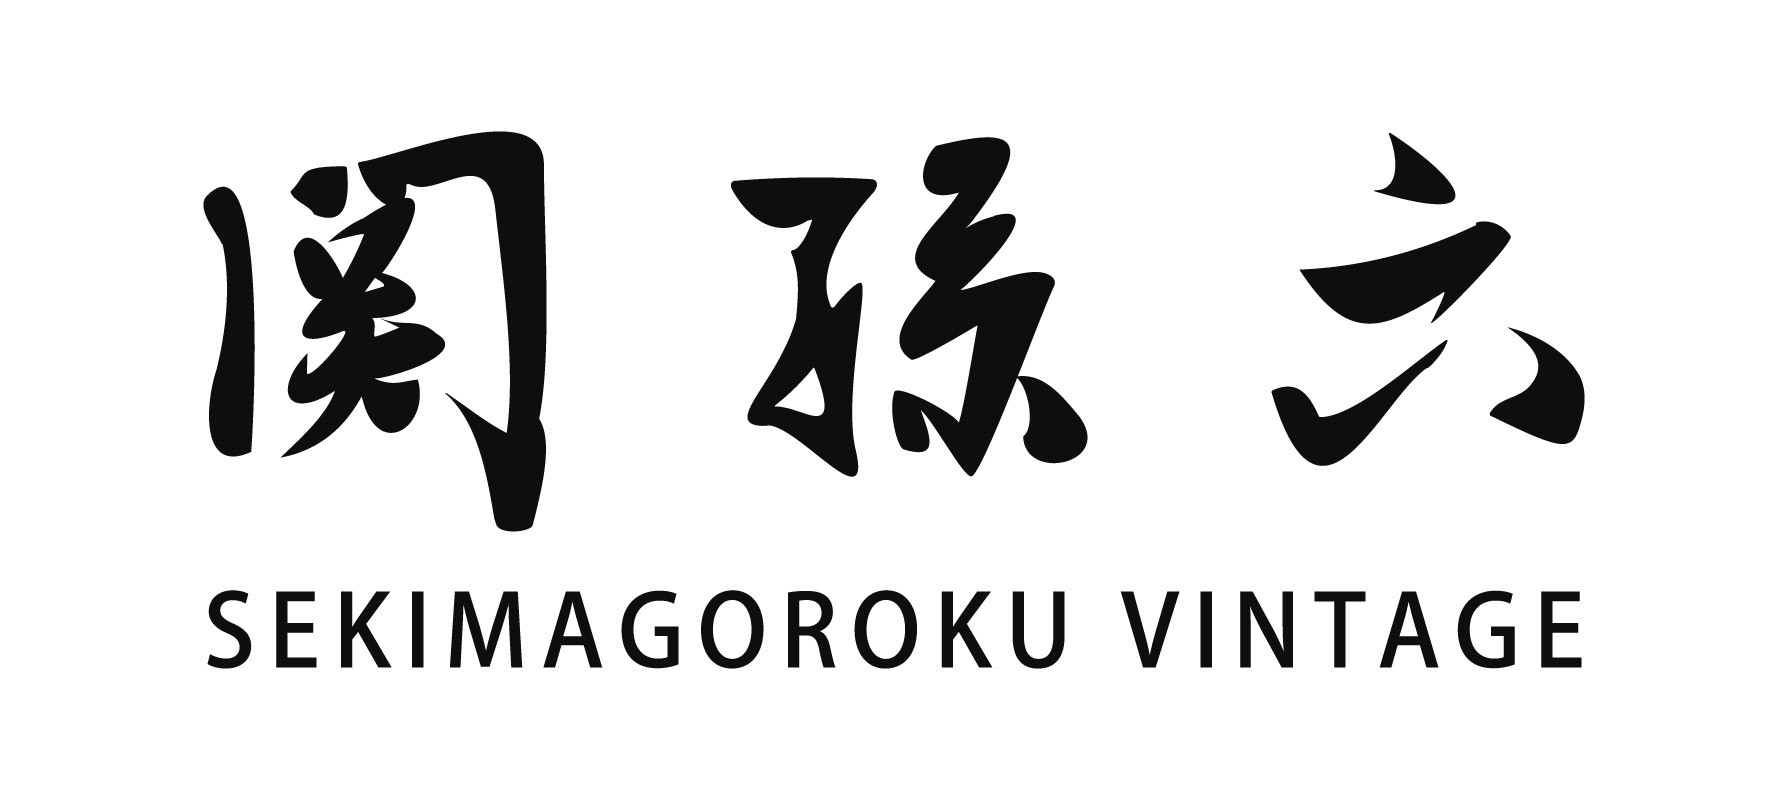 Seki Magoroku Vintage 200mm Chefs Knife